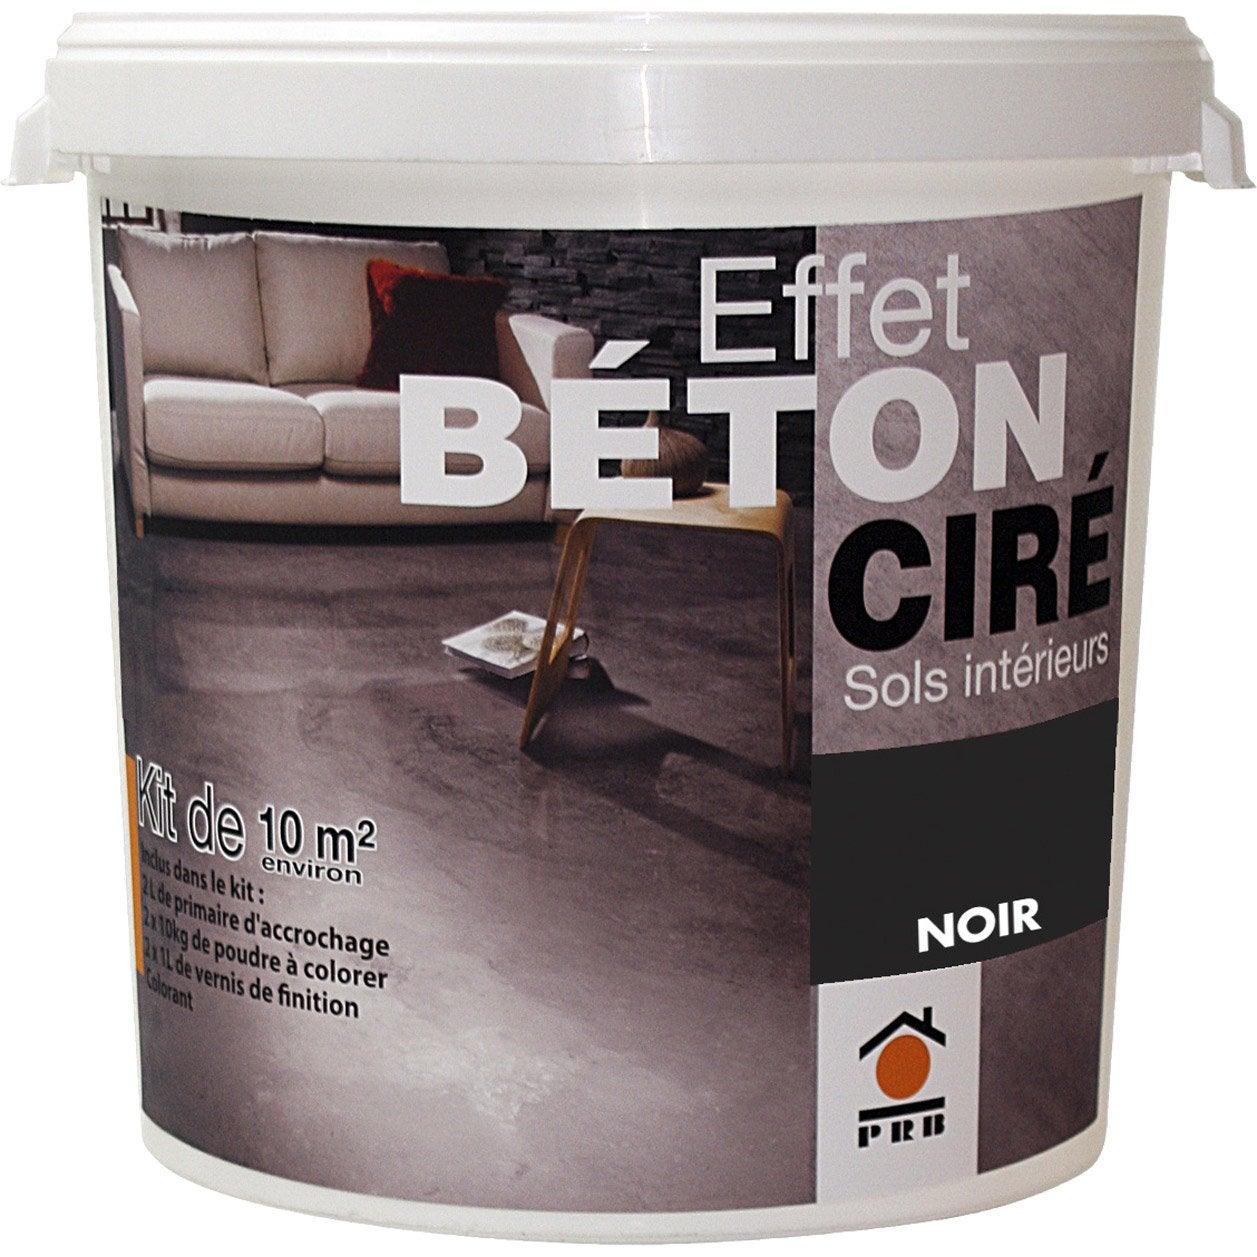 B ton effet cir noir prb 10m leroy merlin - Beton decoratif leroy merlin ...